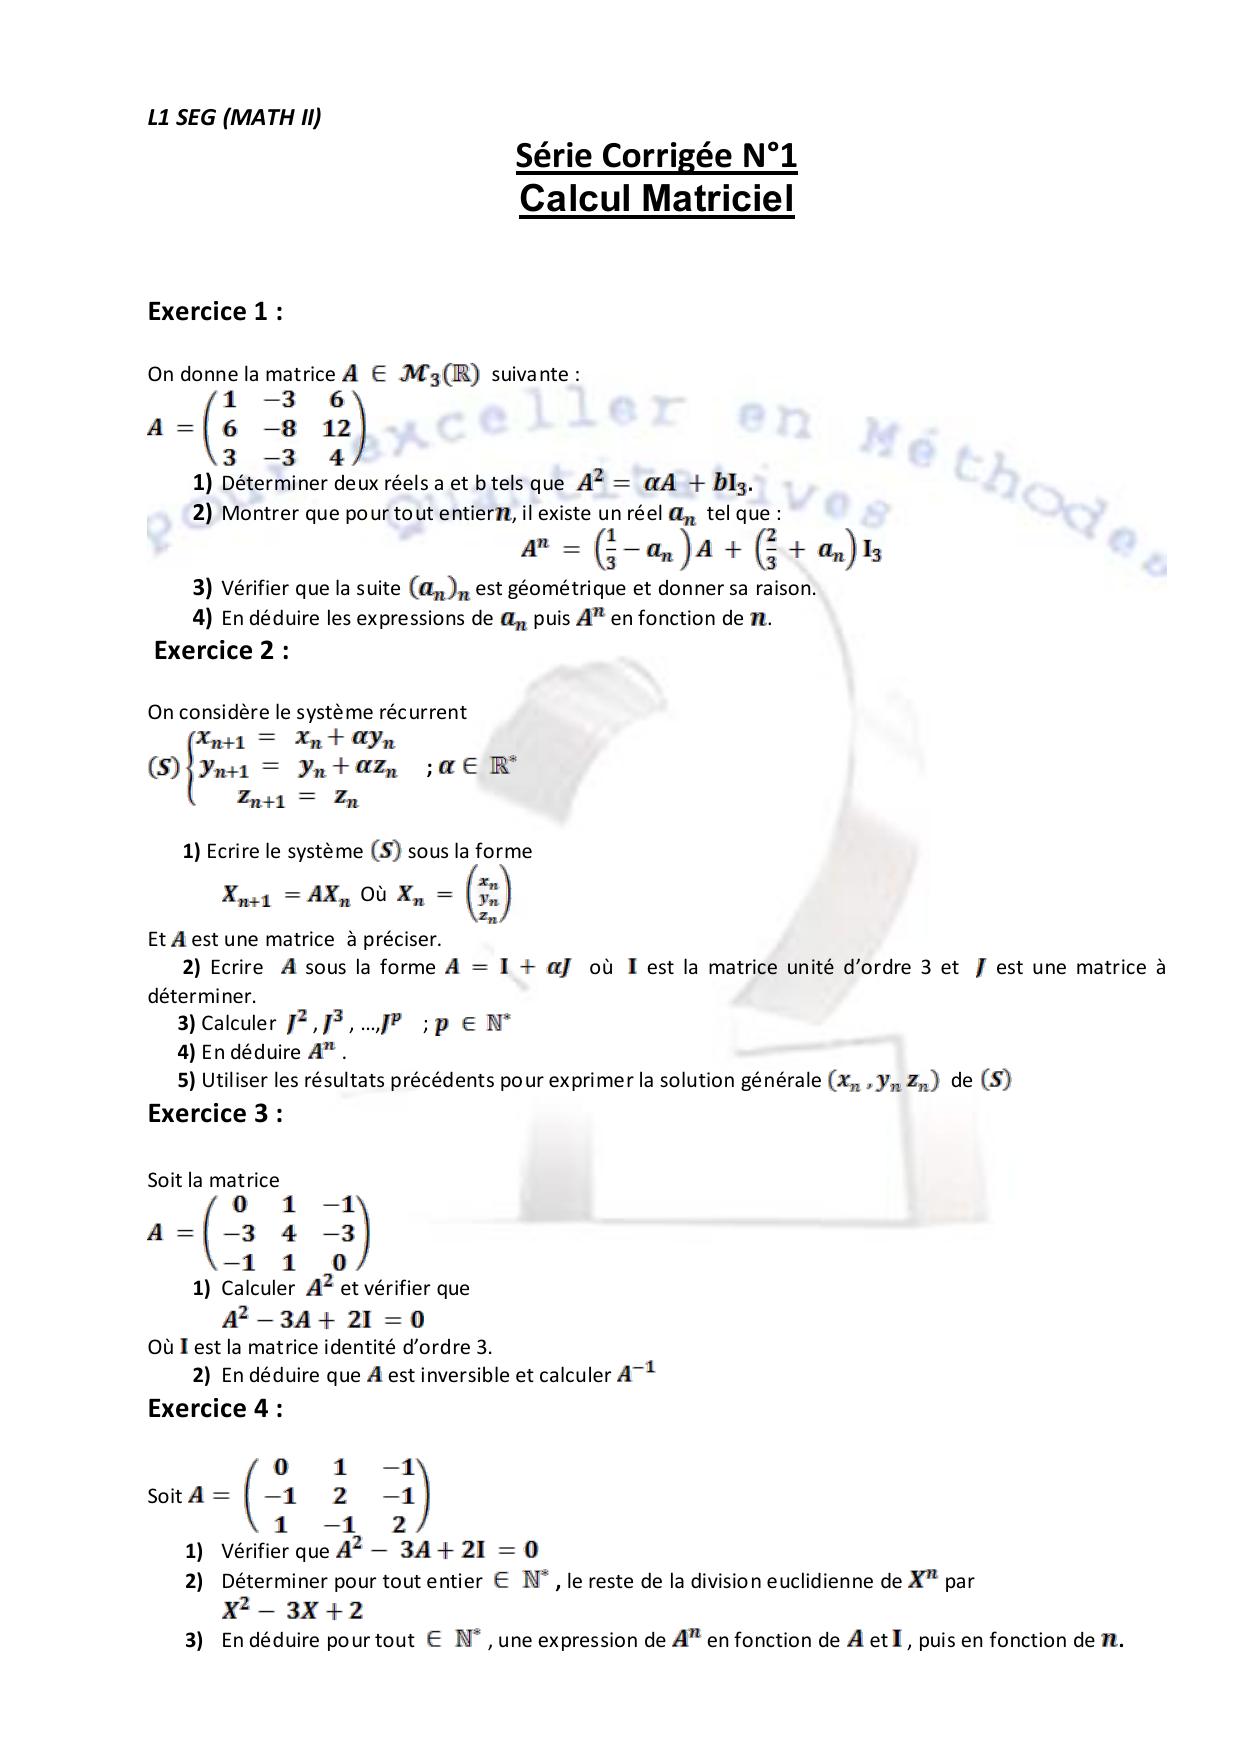 Serie Corrigee N 1 Calcul Matriciel Exercice 1